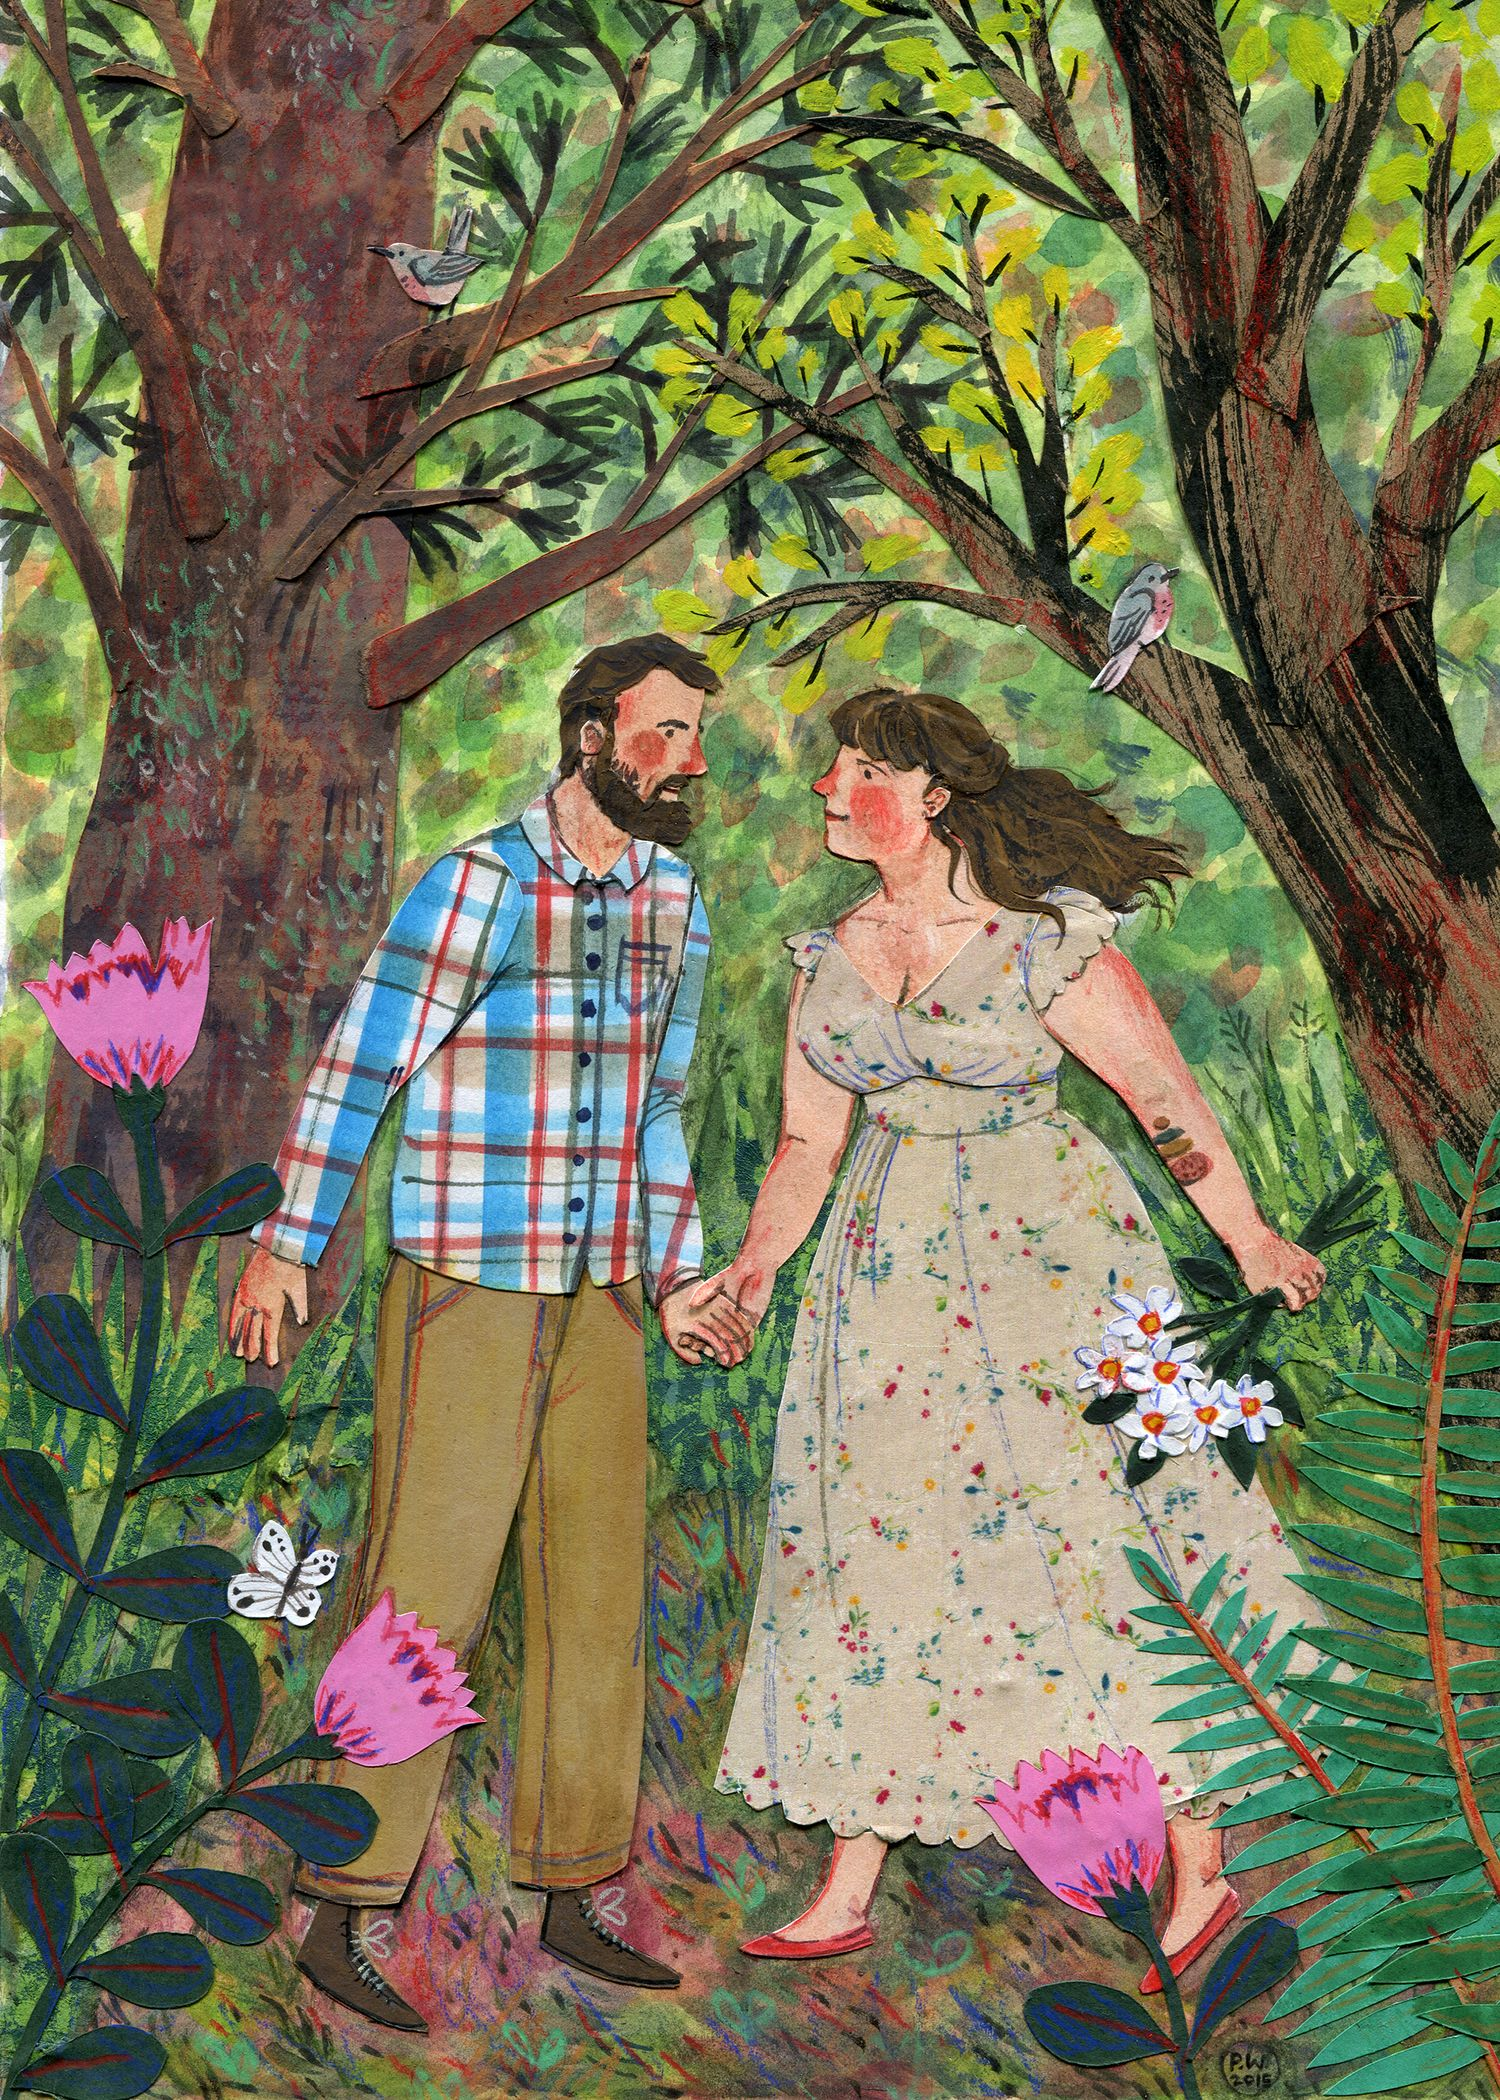 Morgan & Ian by Phoebe Wahl